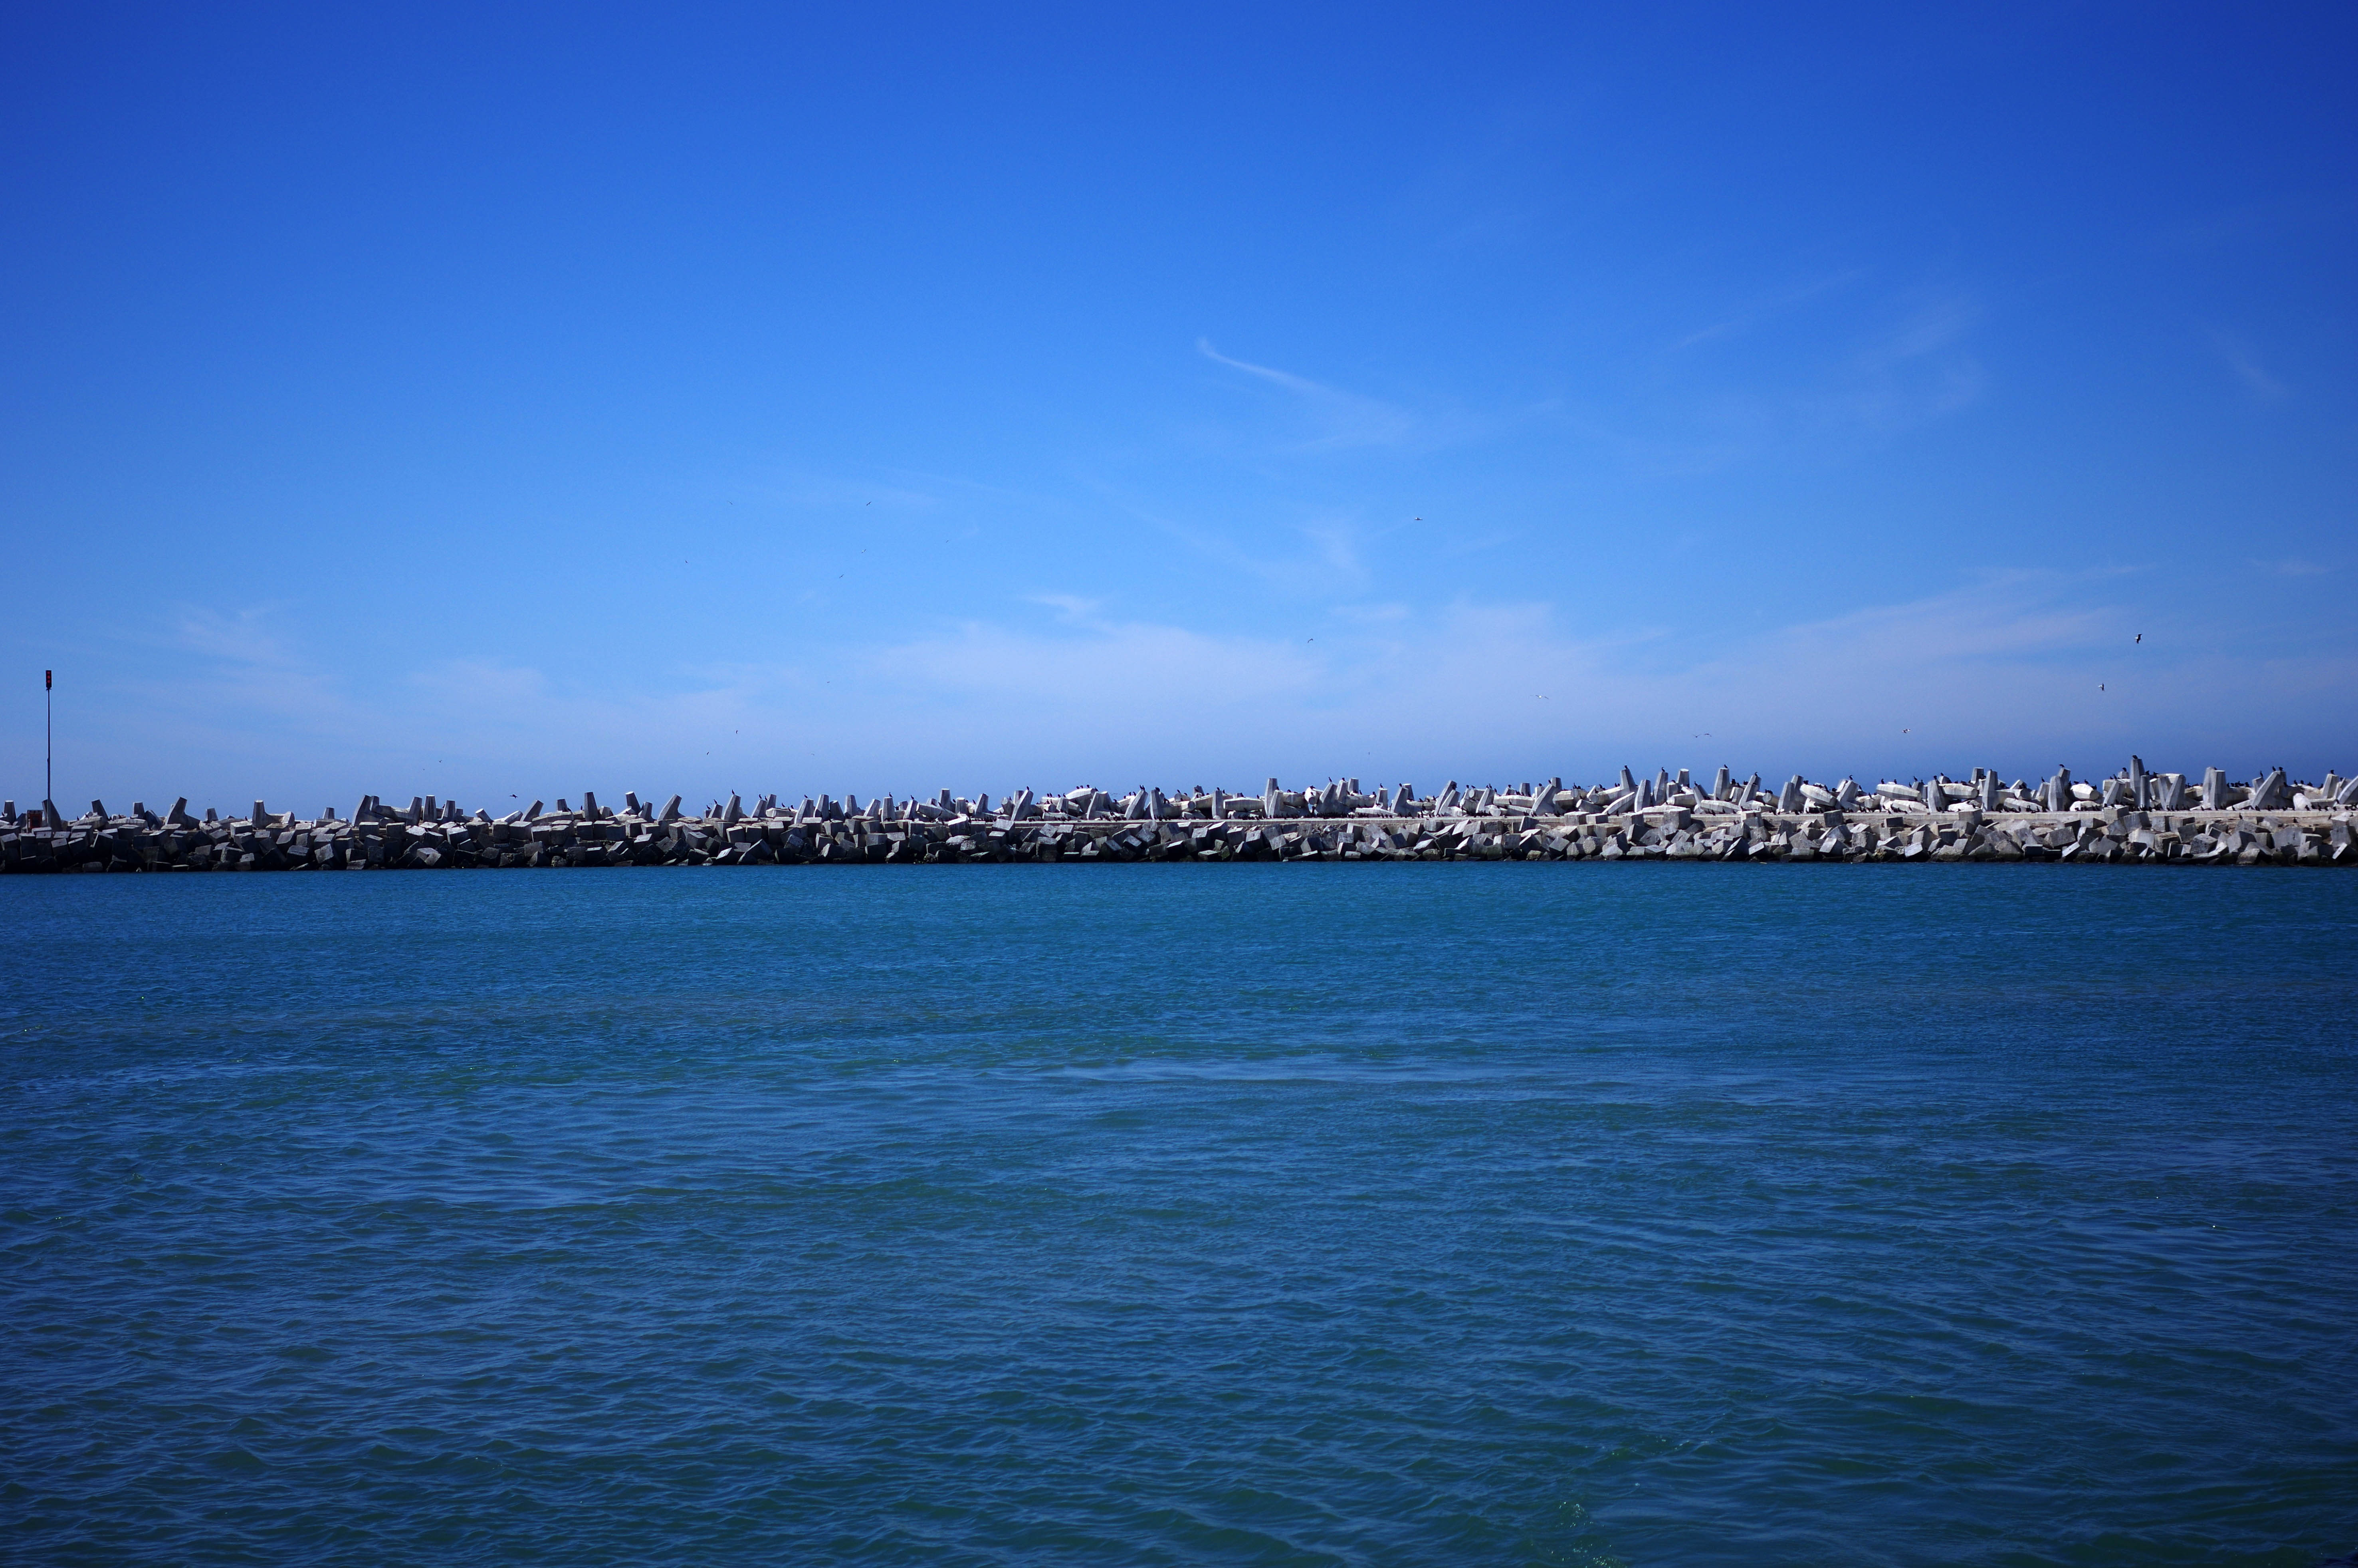 171122_CT_Robben island1